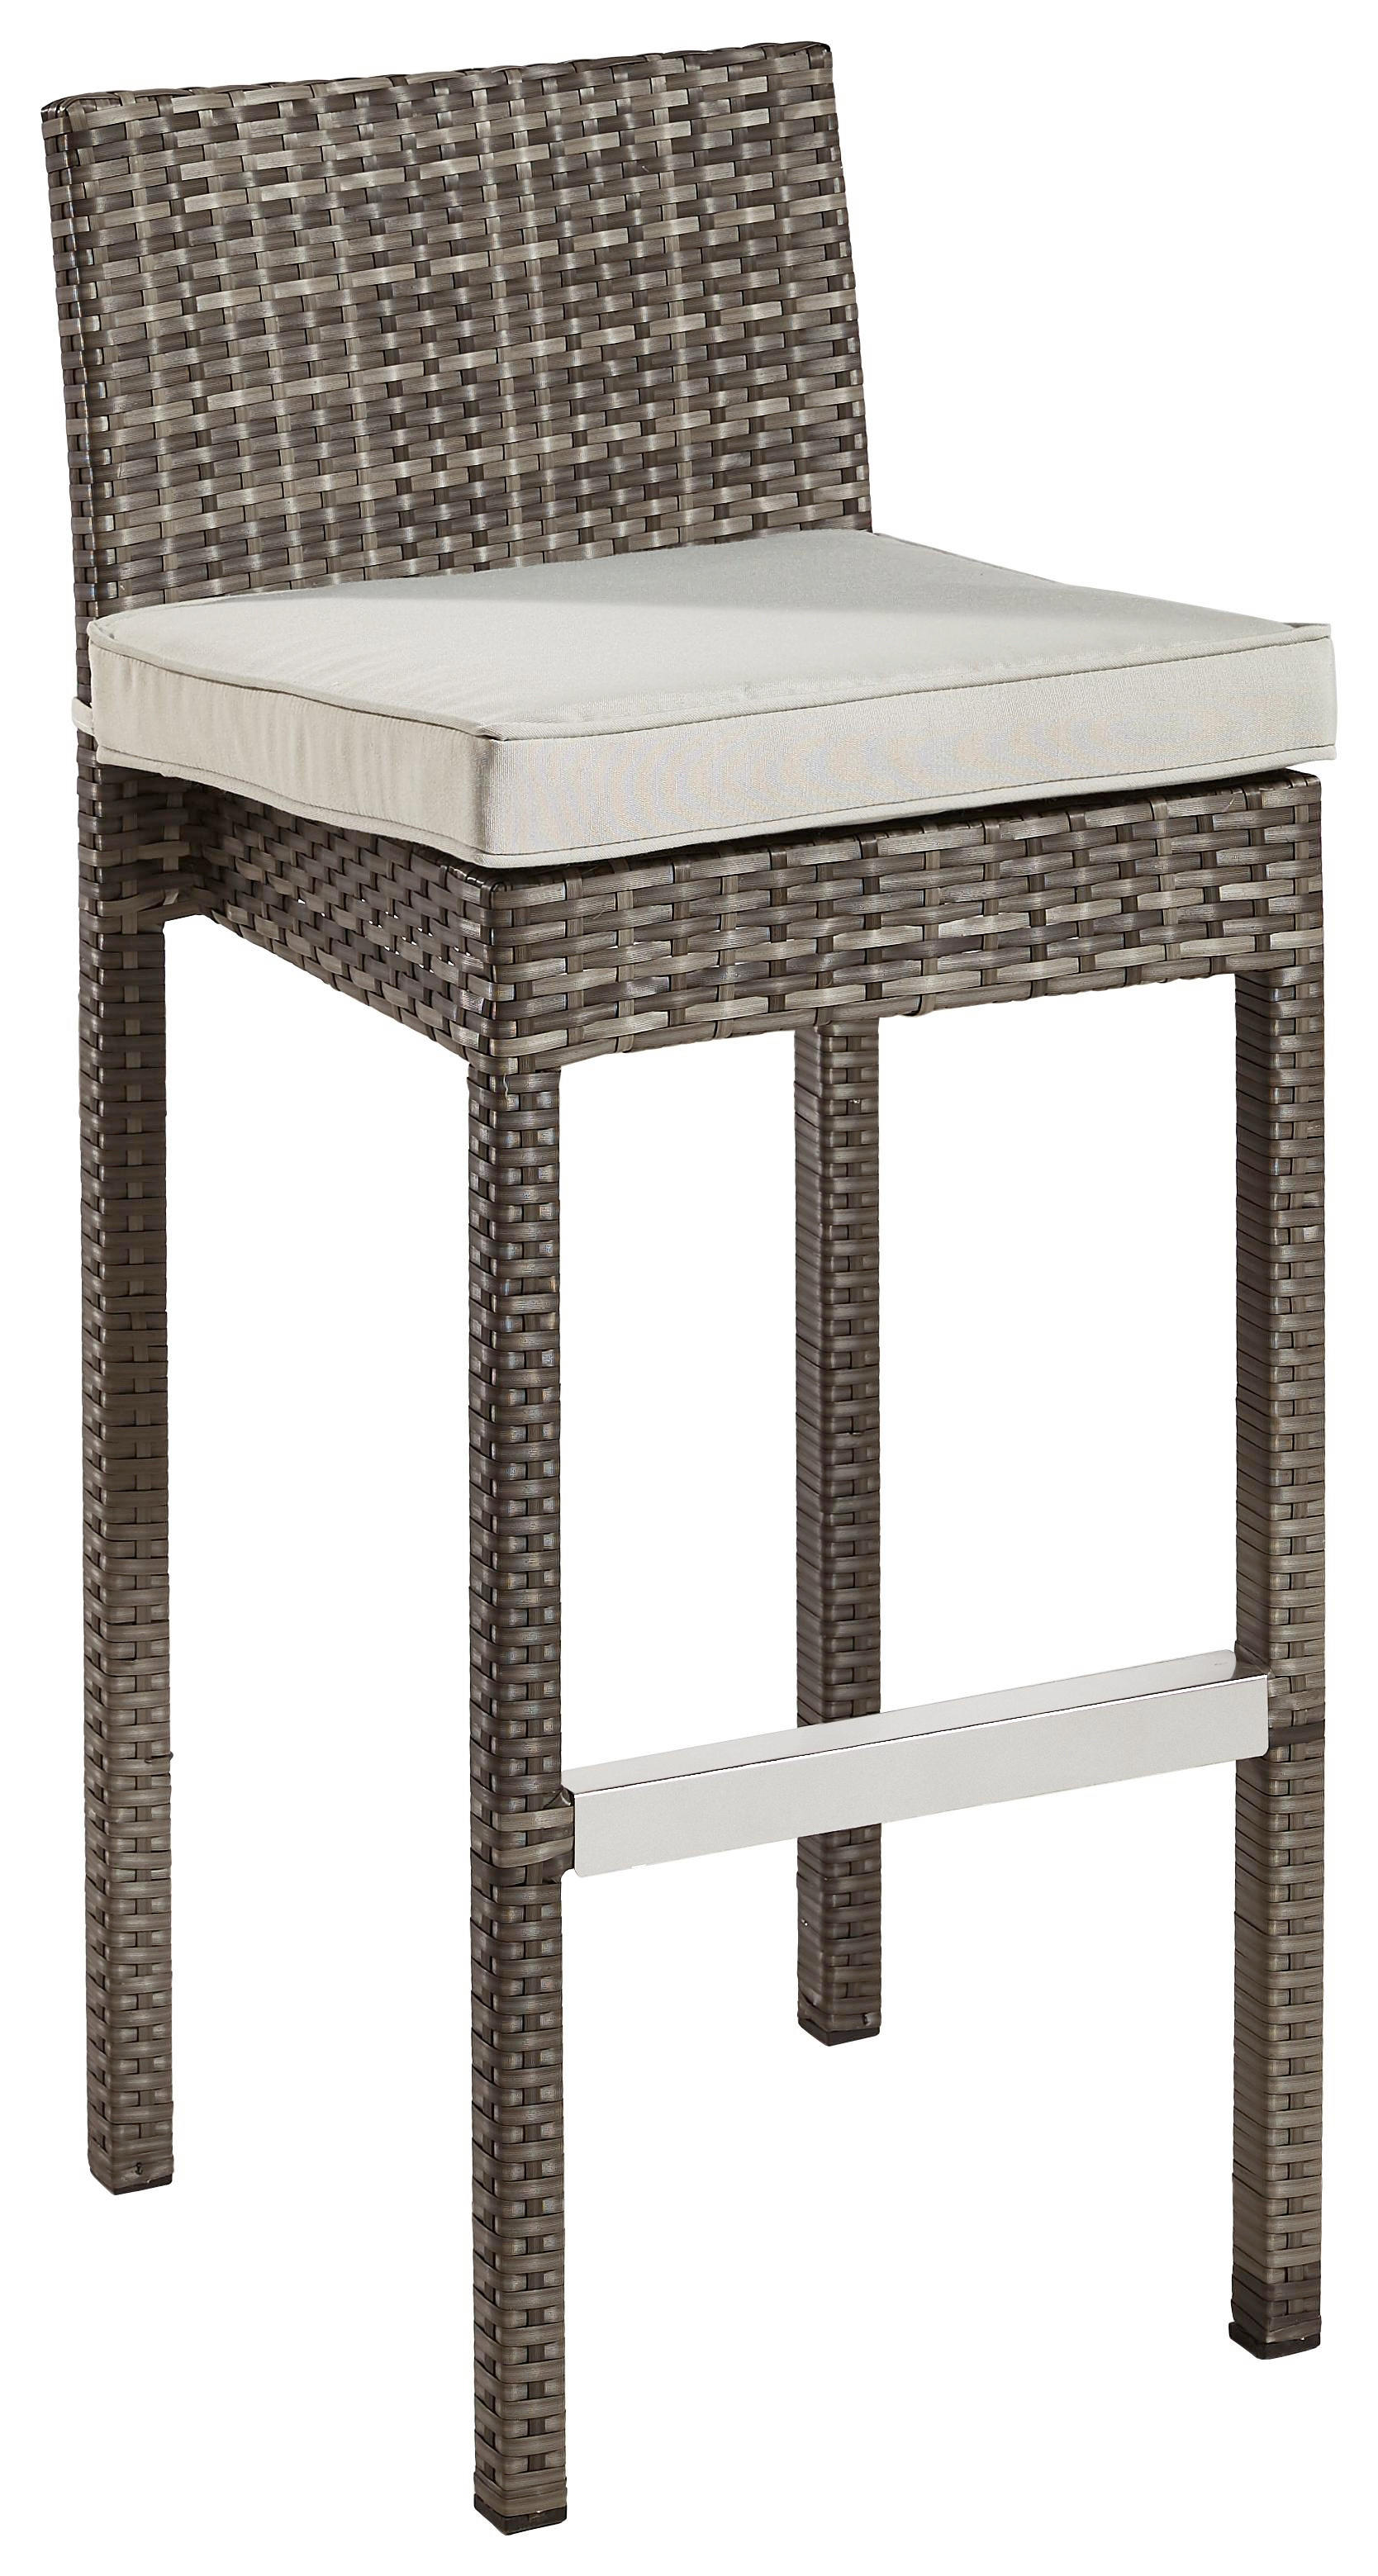 BARHOCKER Grau, Hellgrau - Hellgrau/Grau, Design, Kunststoff/Textil (43/100/51cm) - AMBIA GARDEN